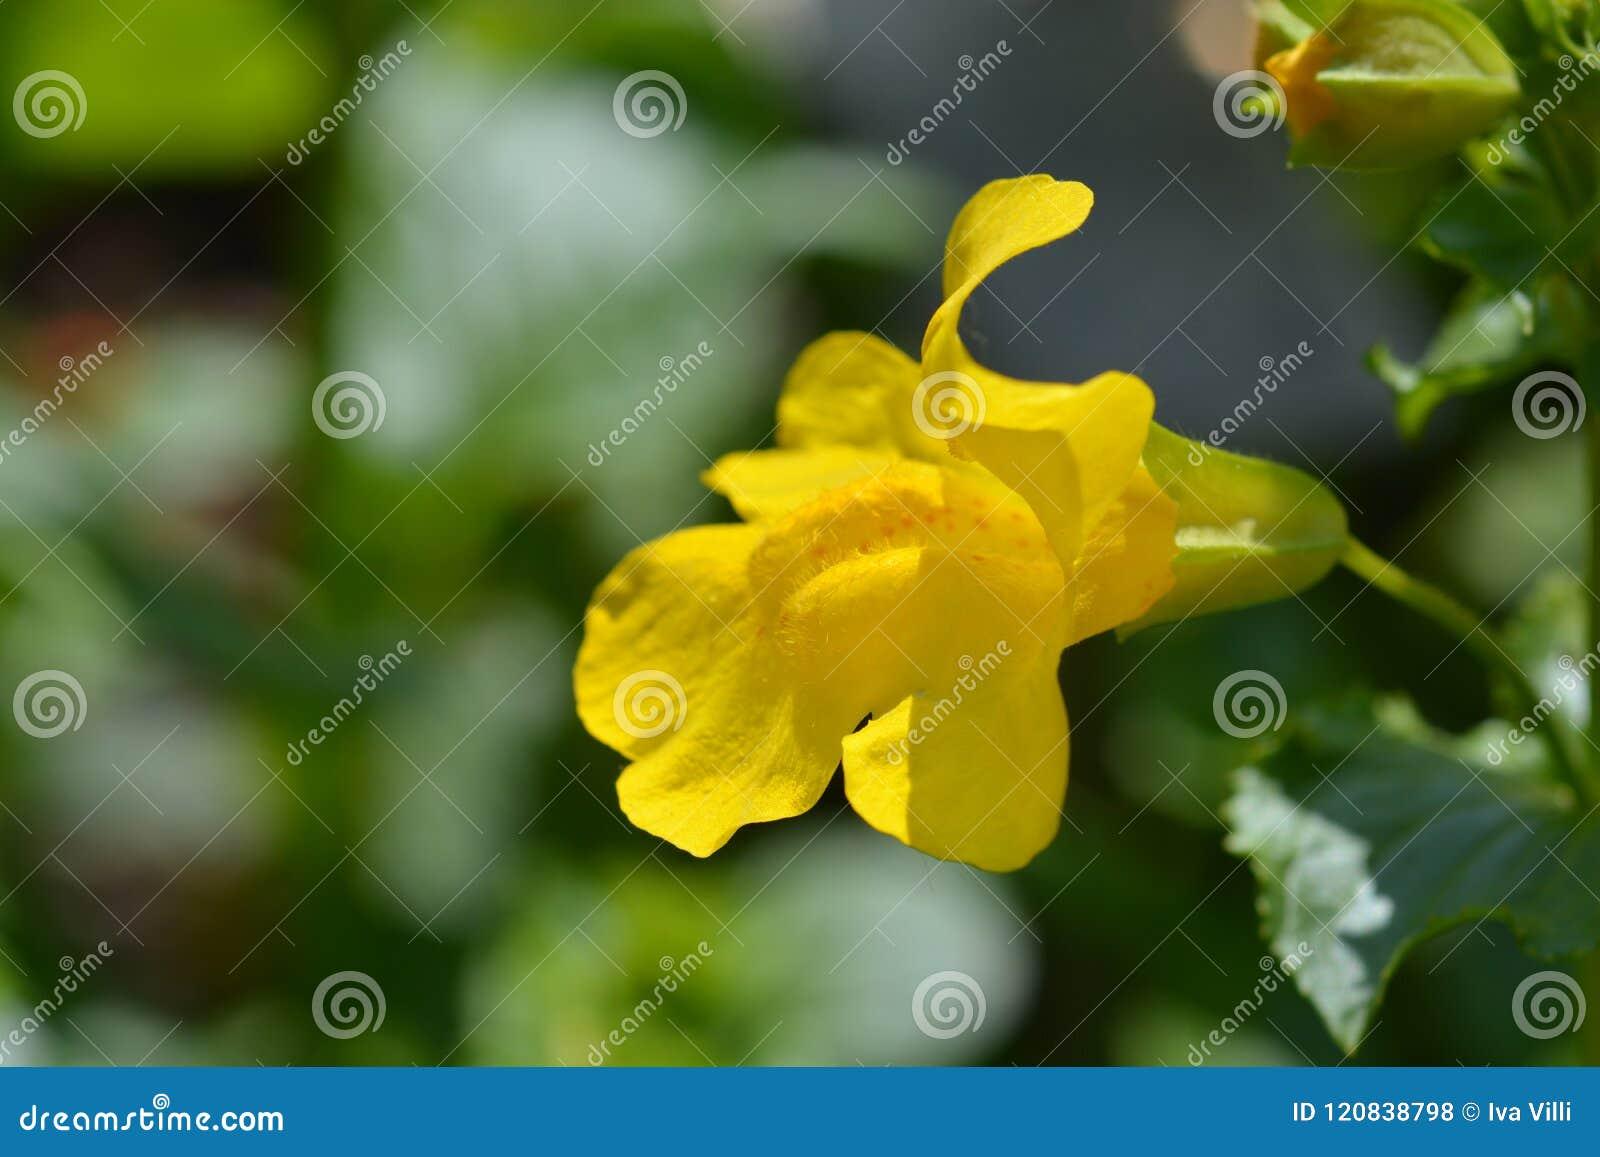 Monkey Flower Stock Photo Image Of Yellow Nature Snapdragon